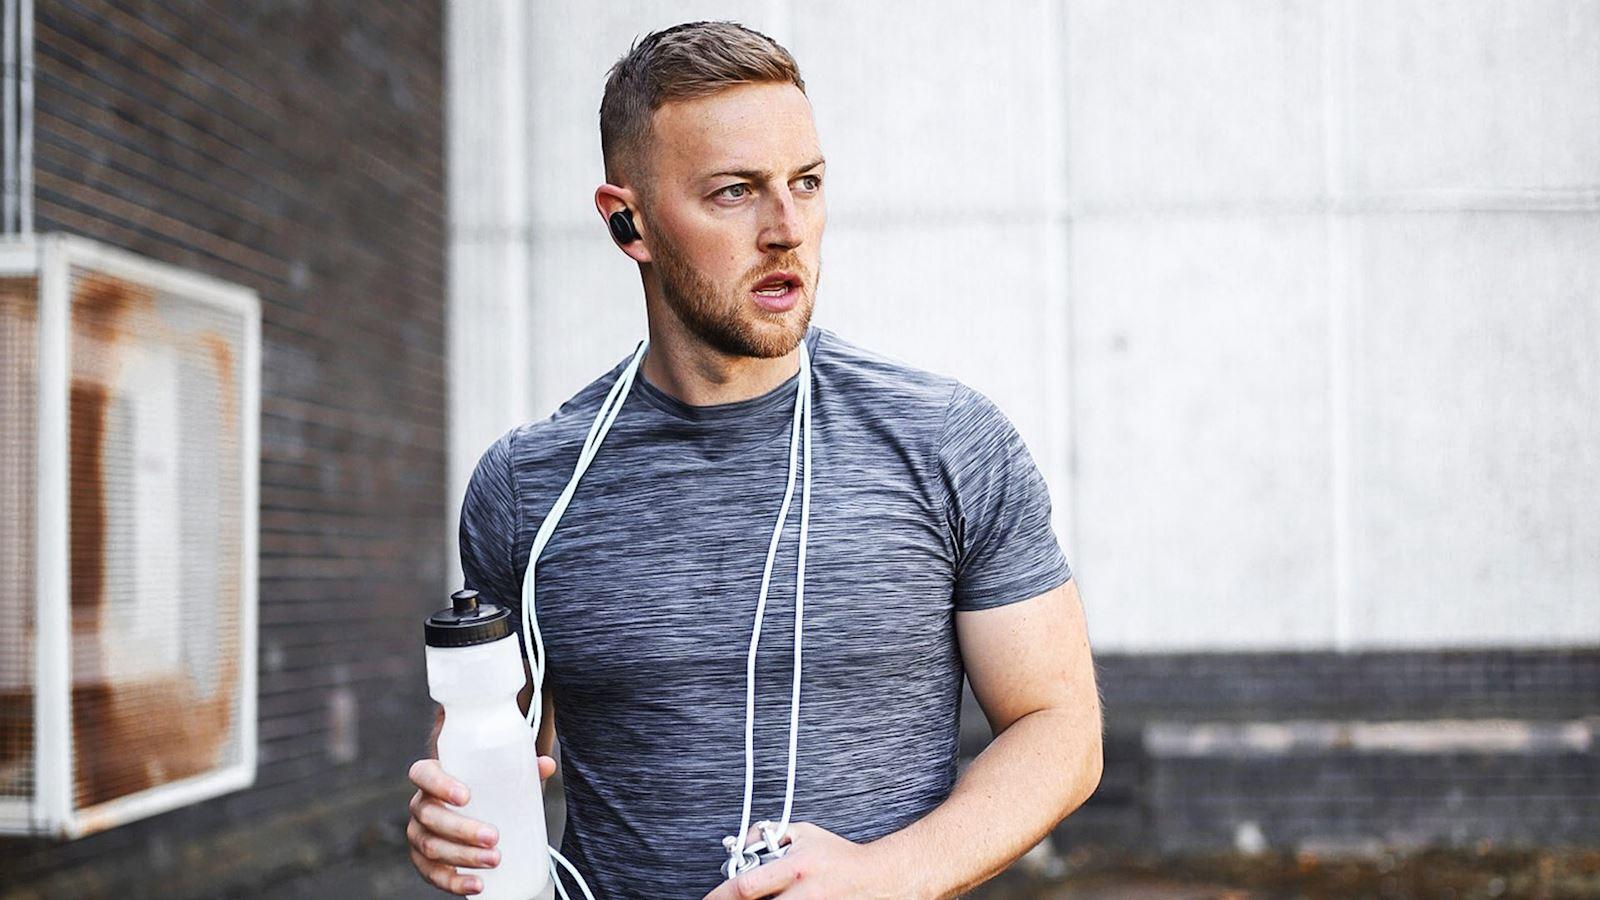 tai nghe Bose Sport Earbuds chính hãng - anhduyen audio 5